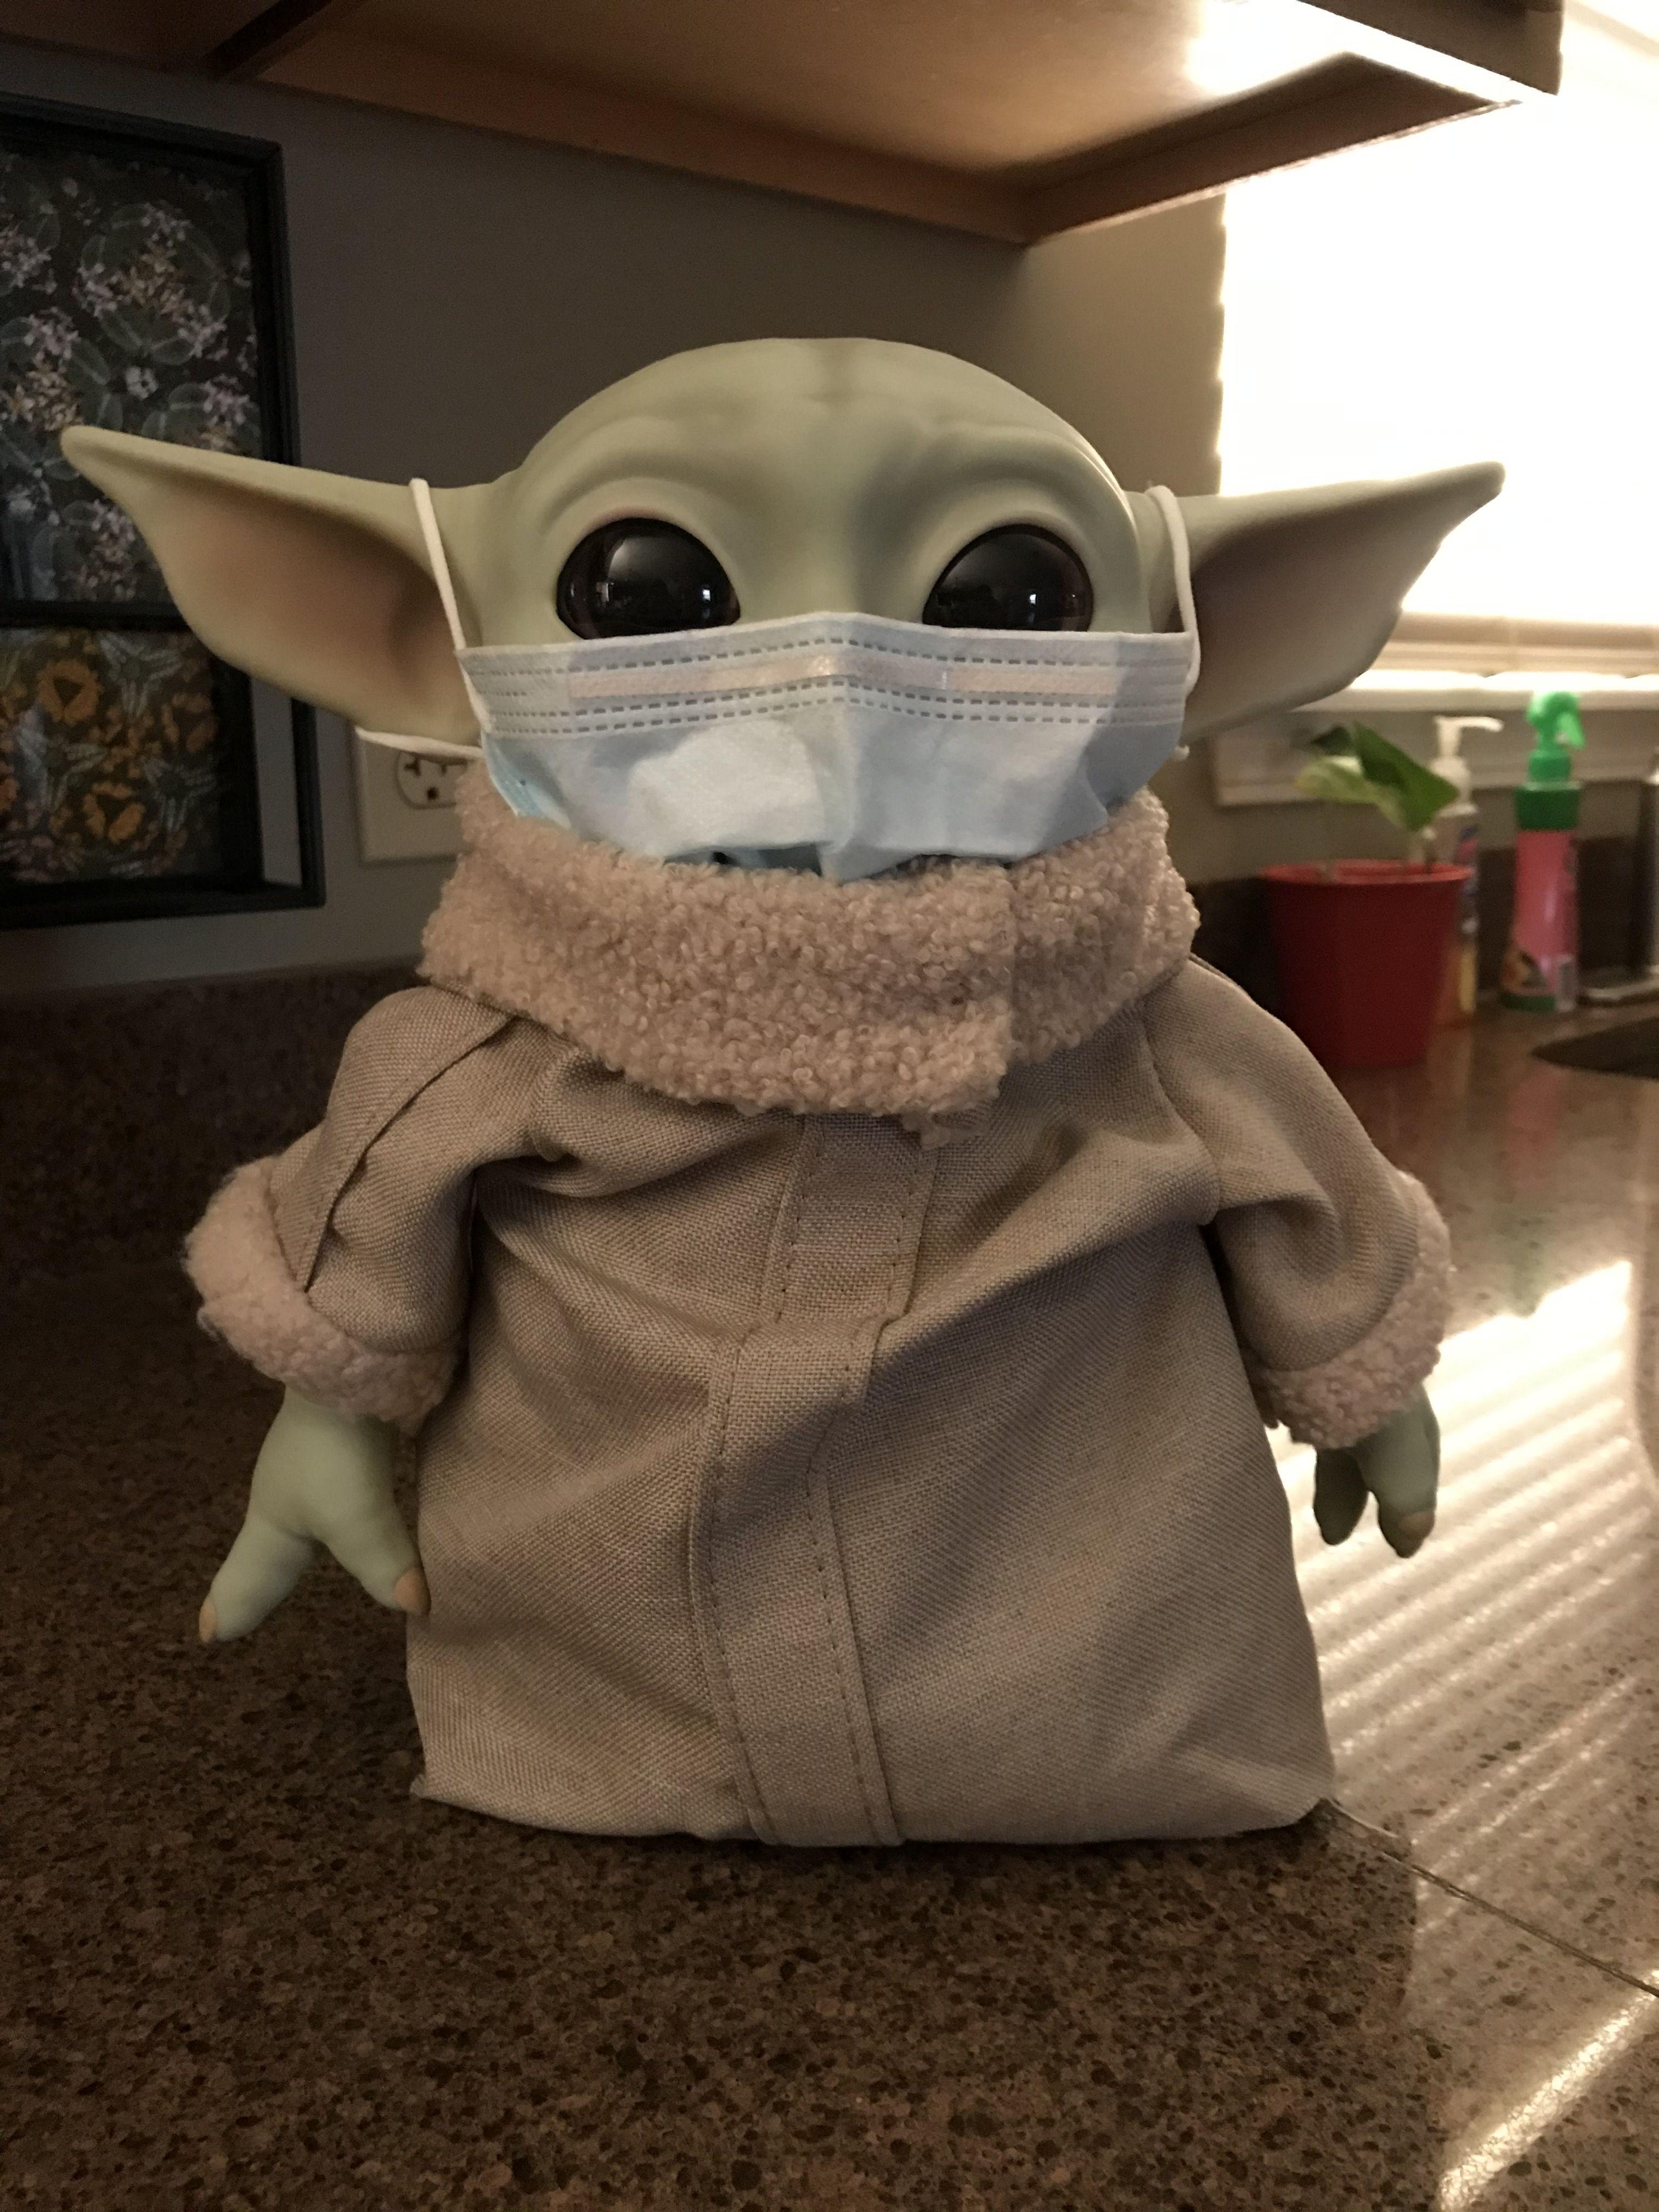 Baby Yoda Getting Ready To Go To The Store Rona Ain T Going To Get Him Yoda Wallpaper Yoda Meme Yoda Images